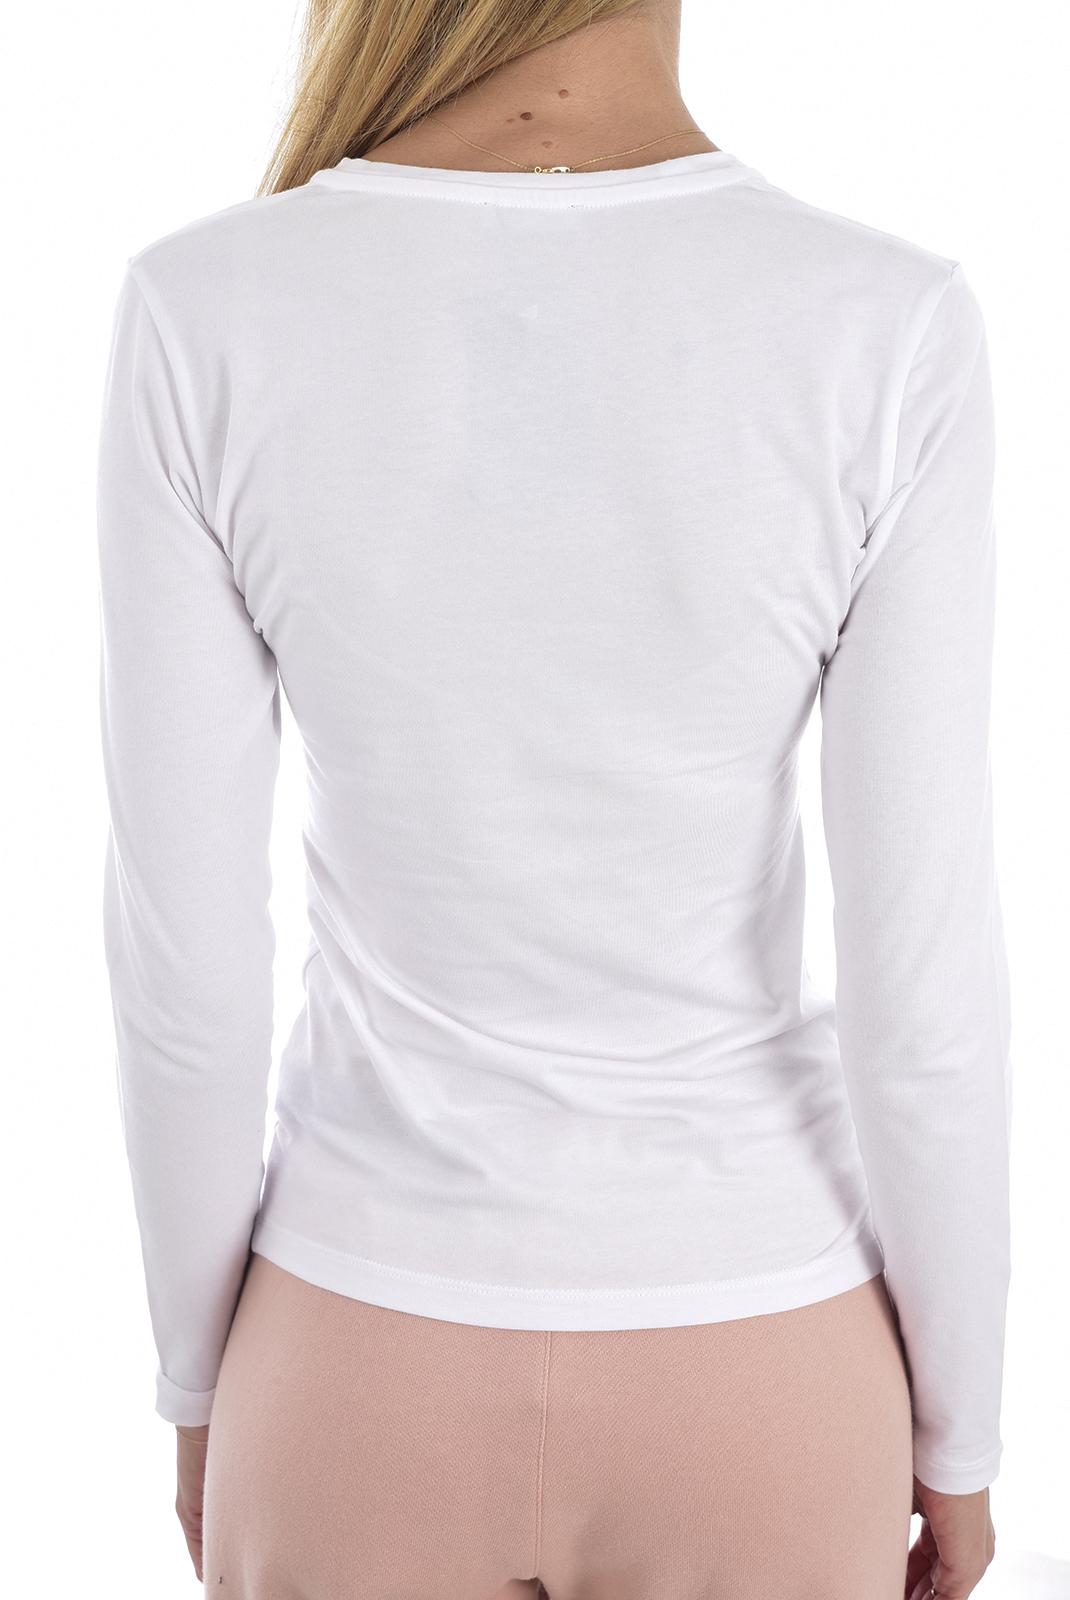 Tee shirt manches longues  Emporio armani 163229 9A232 010 BLANC